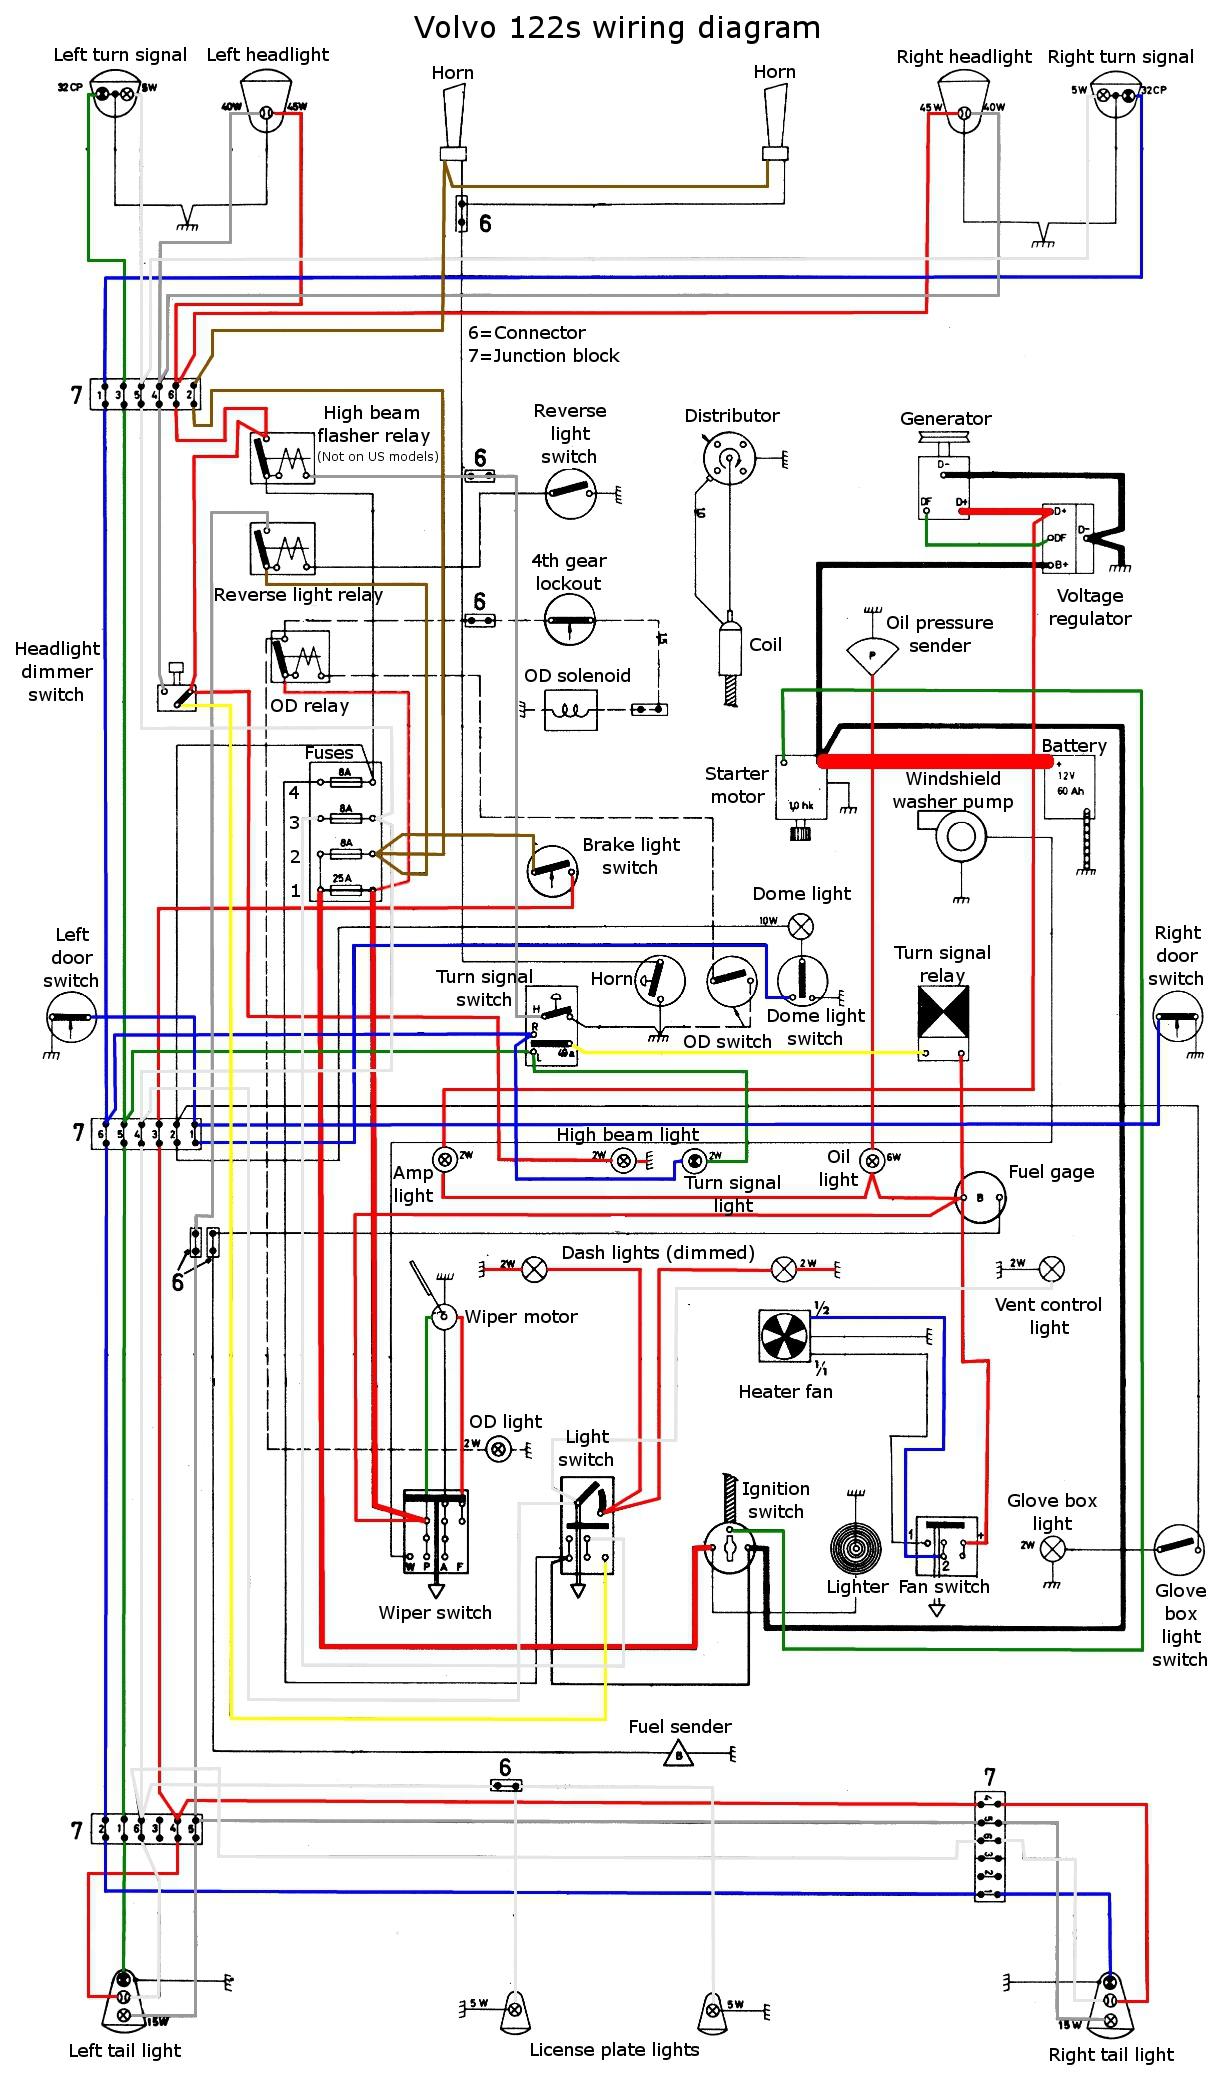 volvo s60 wiring diagram volvo s80 t6 engine diagram